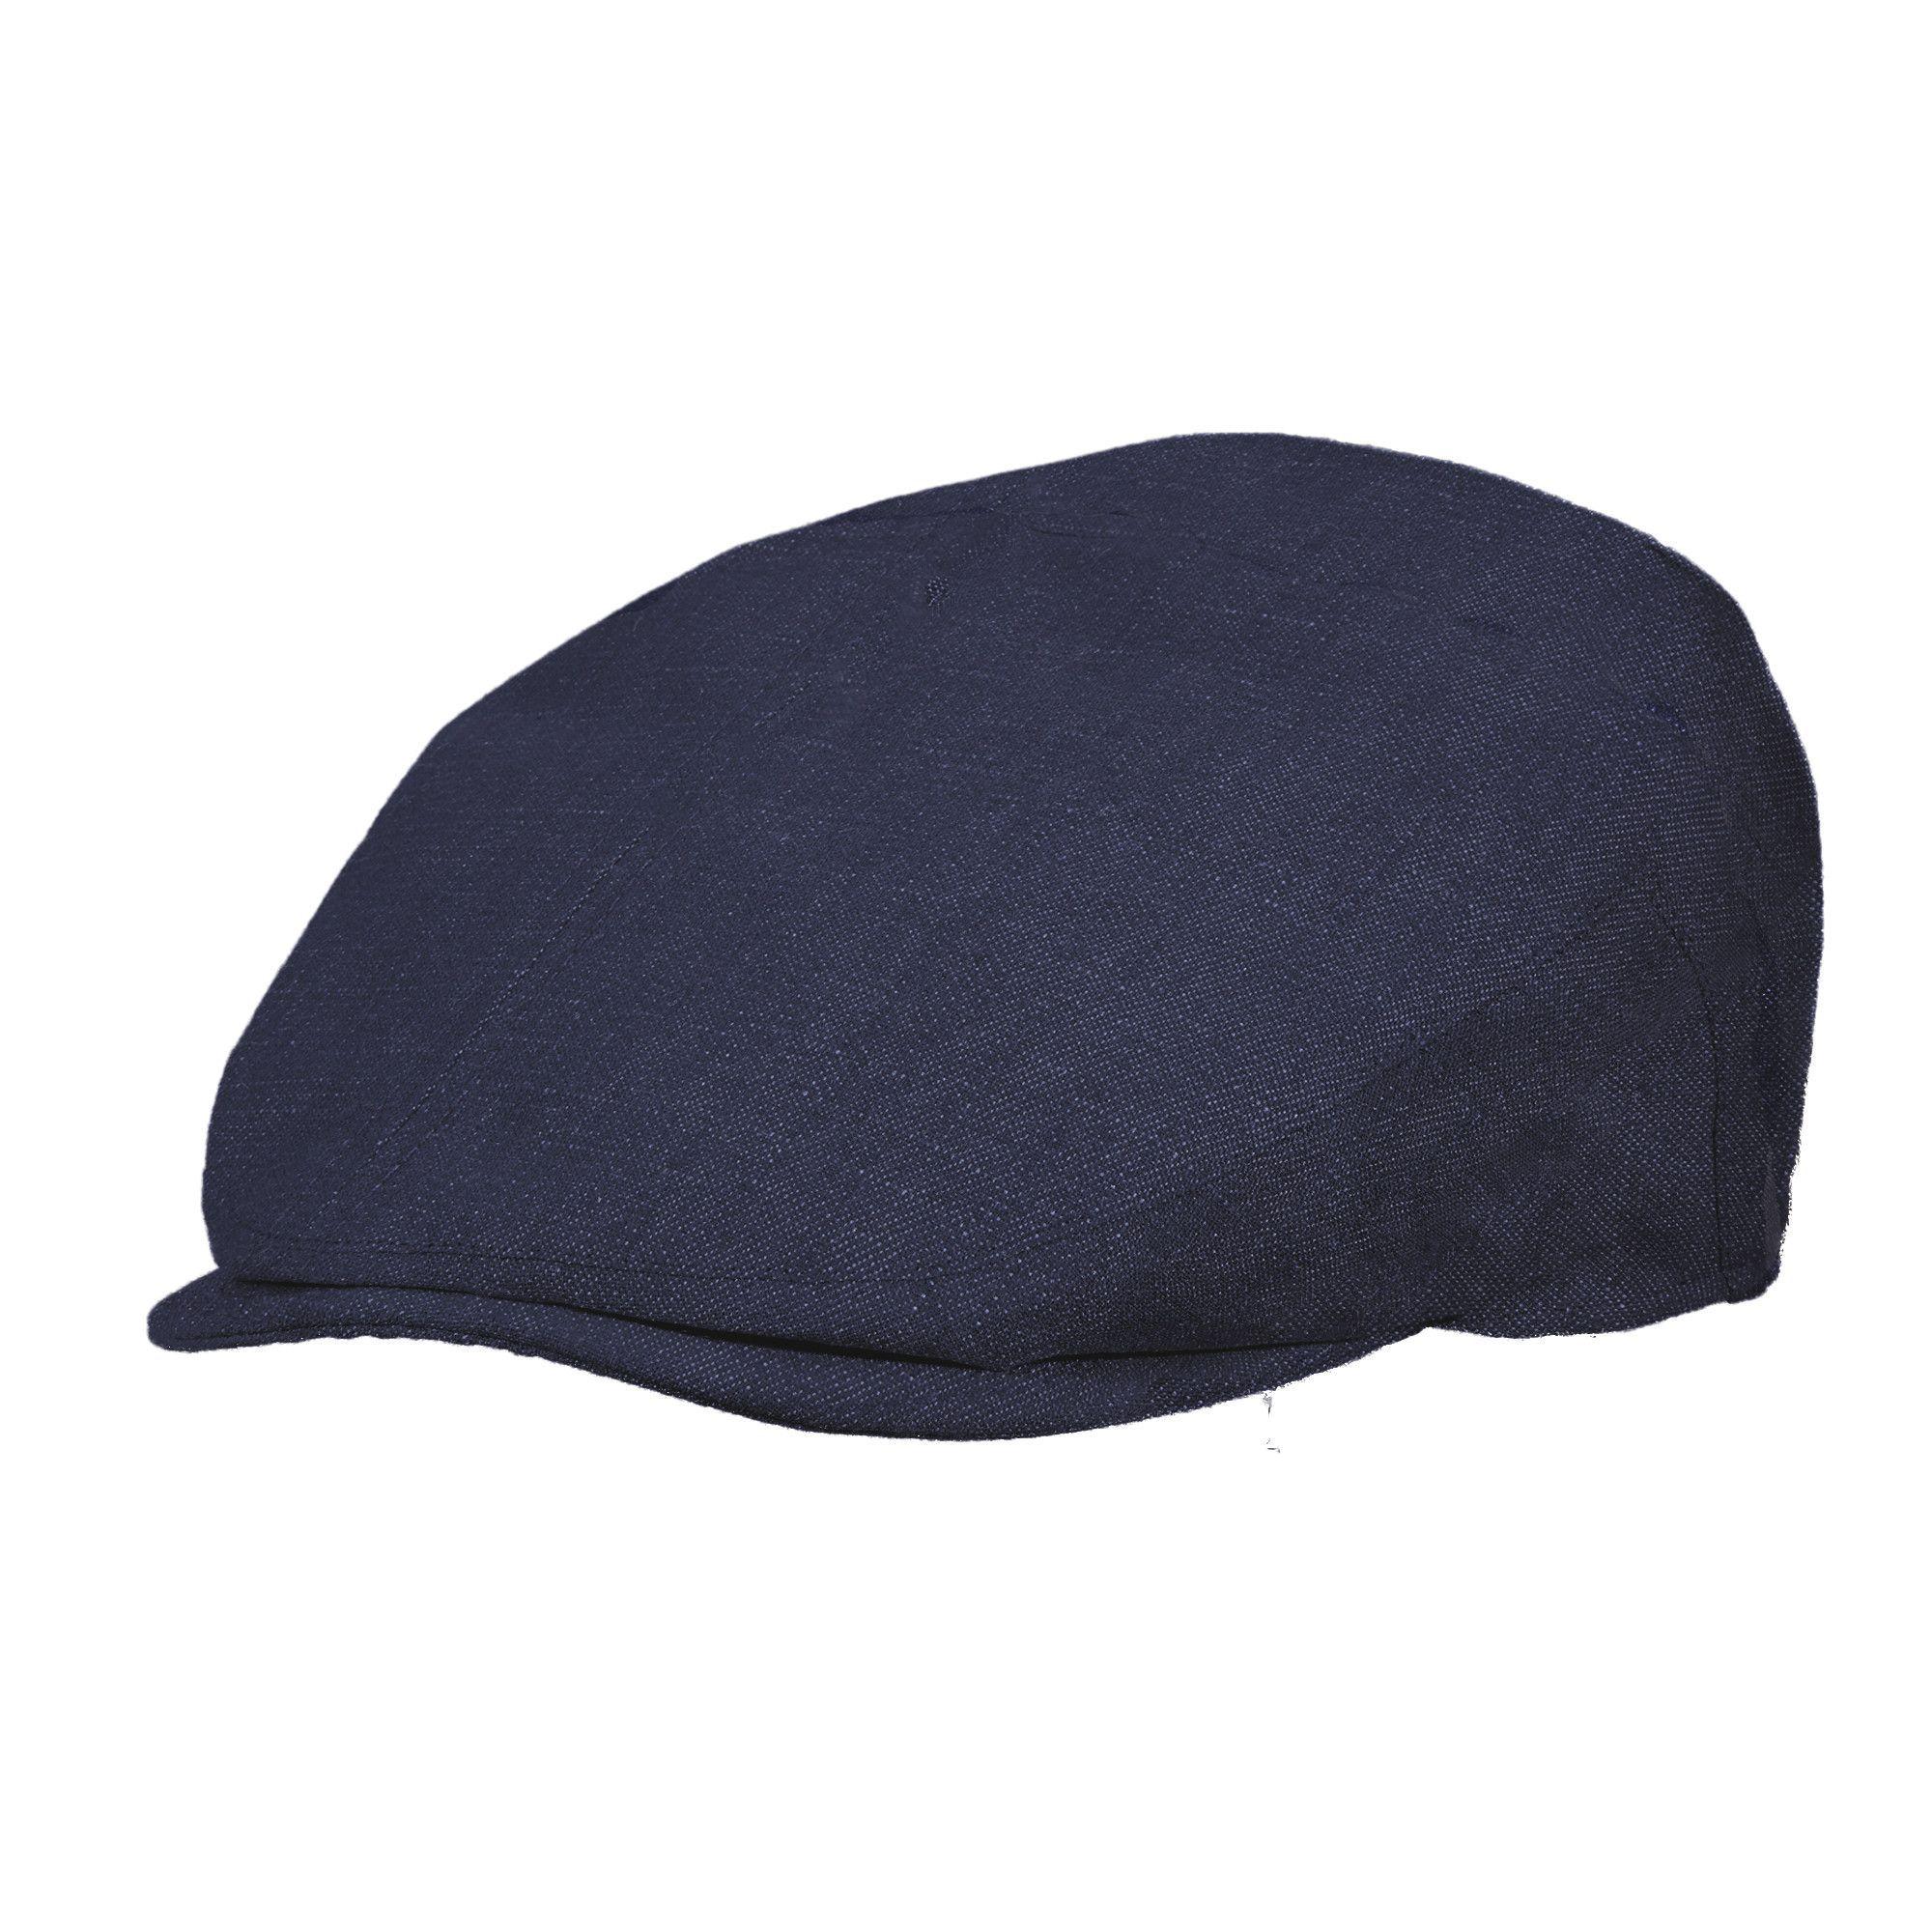 658c39fe Stetson Men's Linen Euro Ivy Driver Cap | Products | Cap, Hats, Mens ...